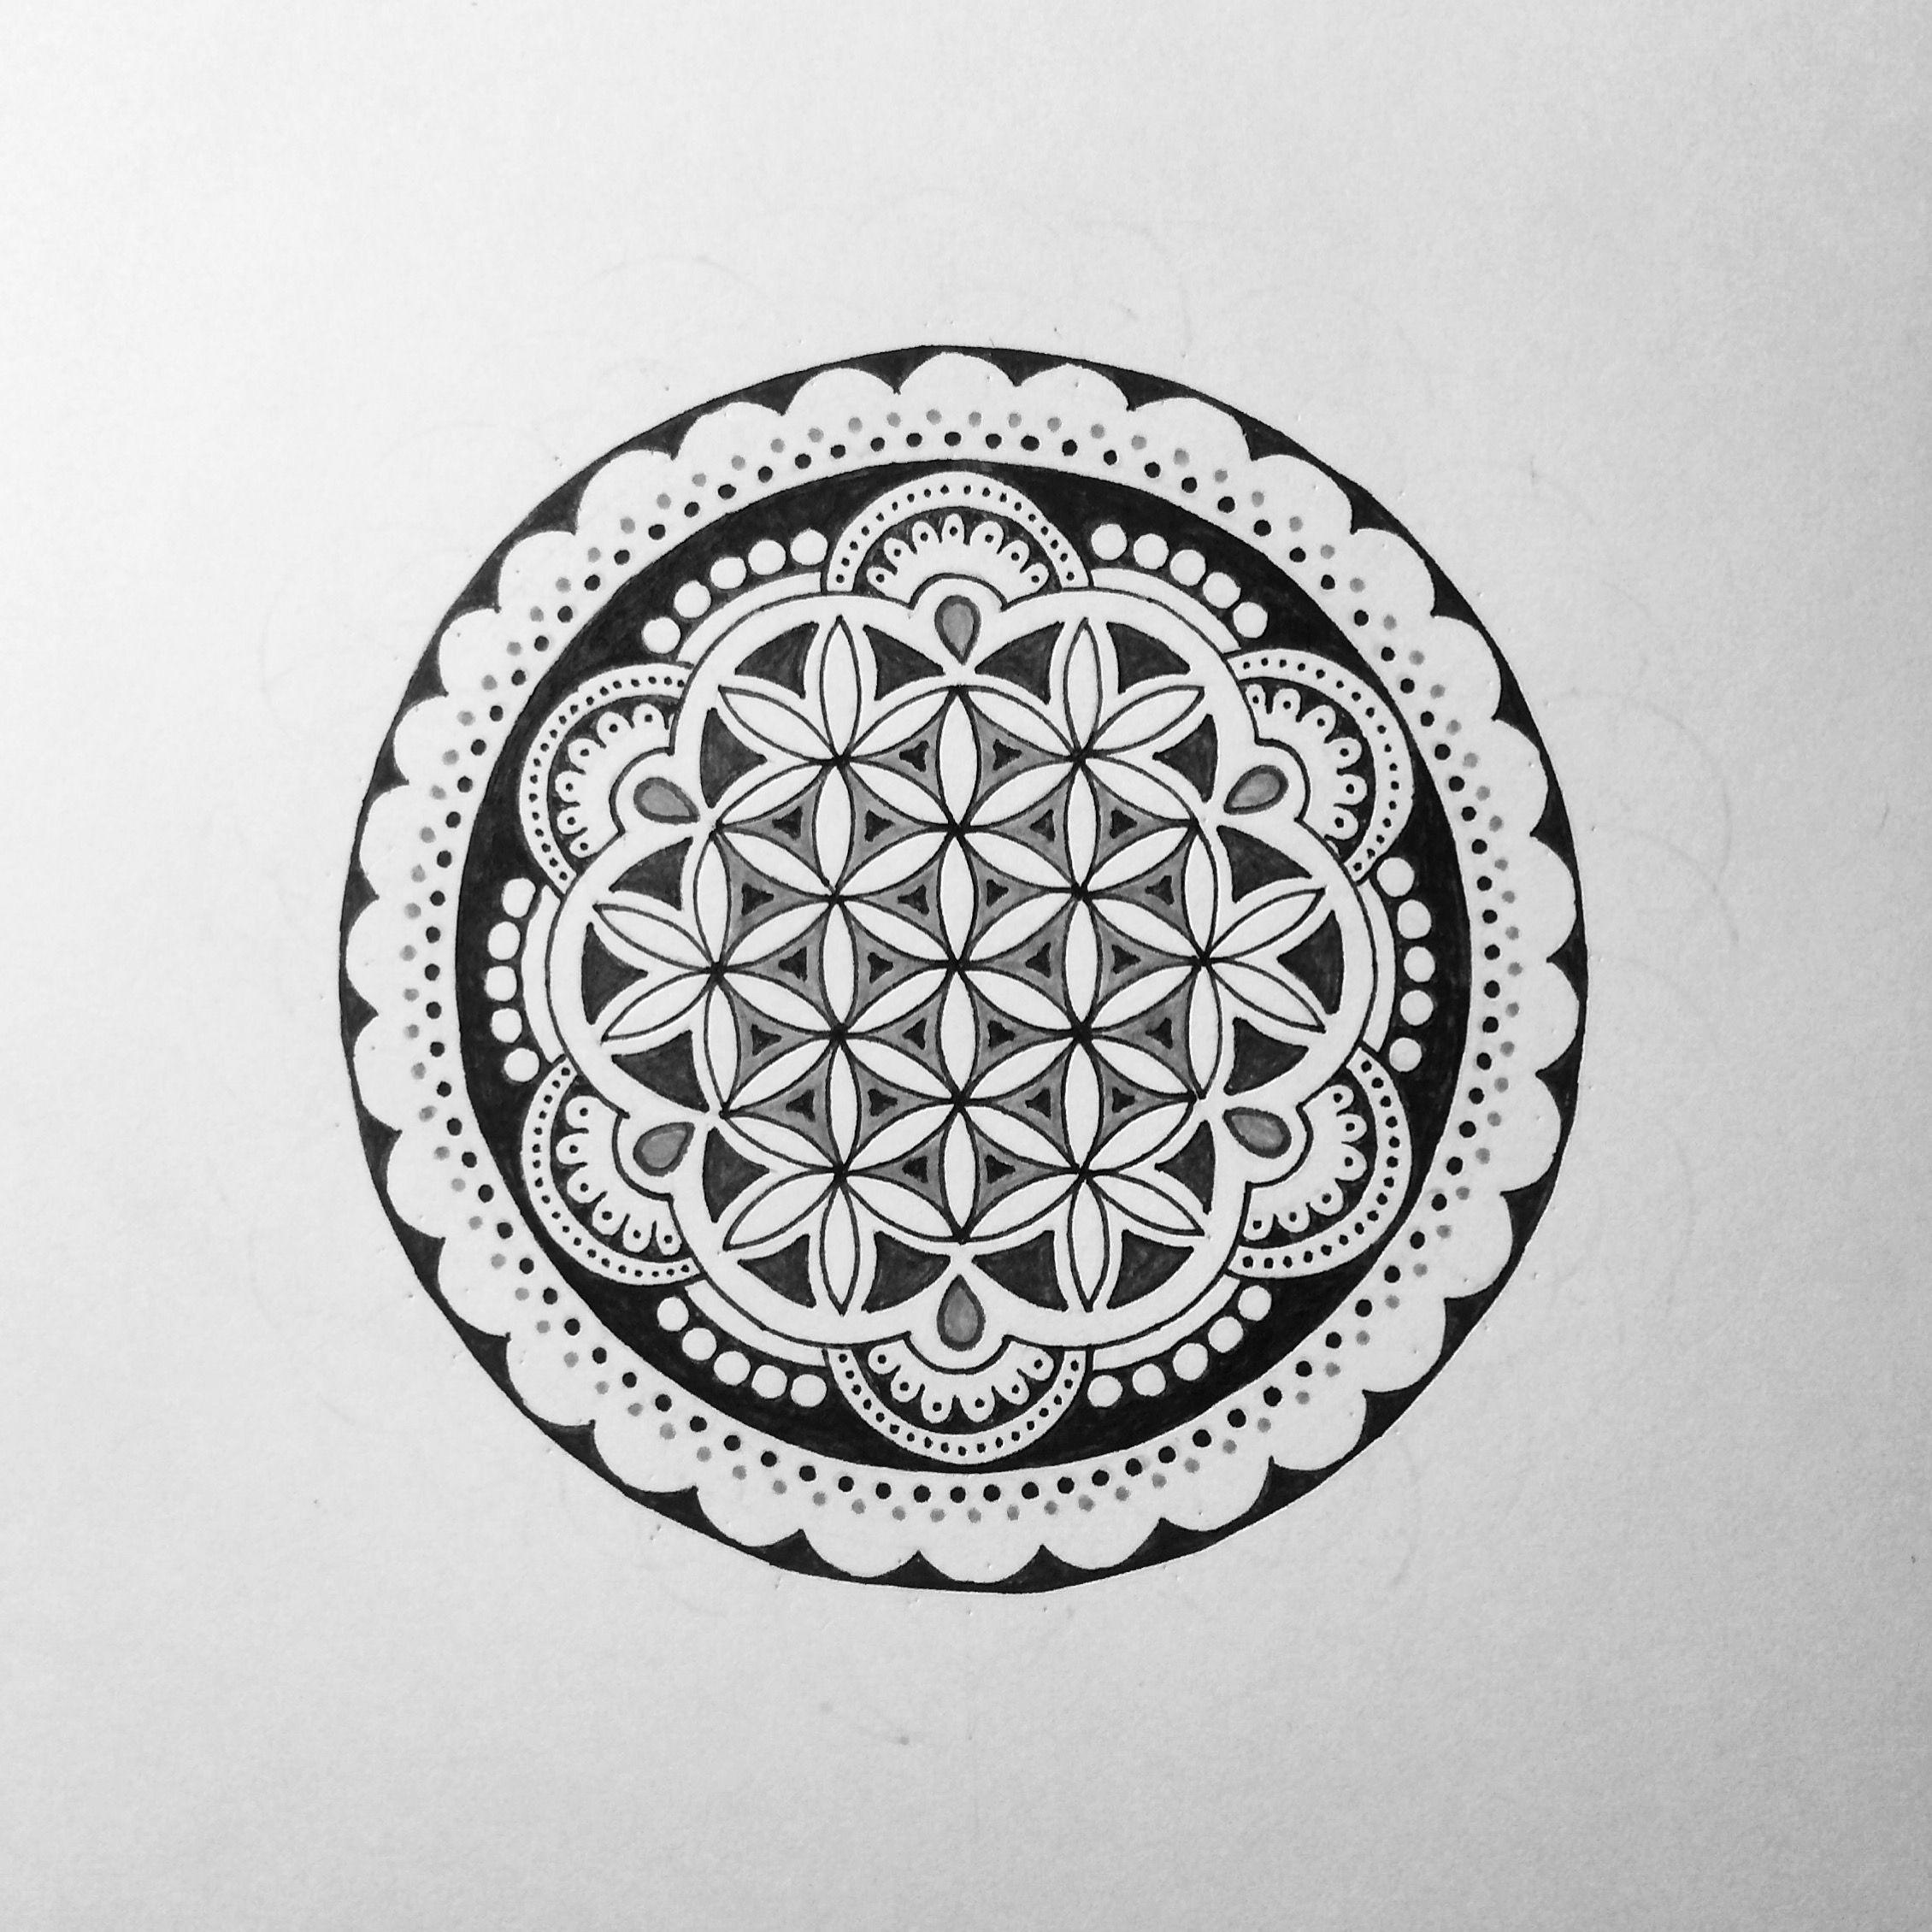 A Flower Of Life Mandala Doodle I Did For A Tattoo Design Mandala